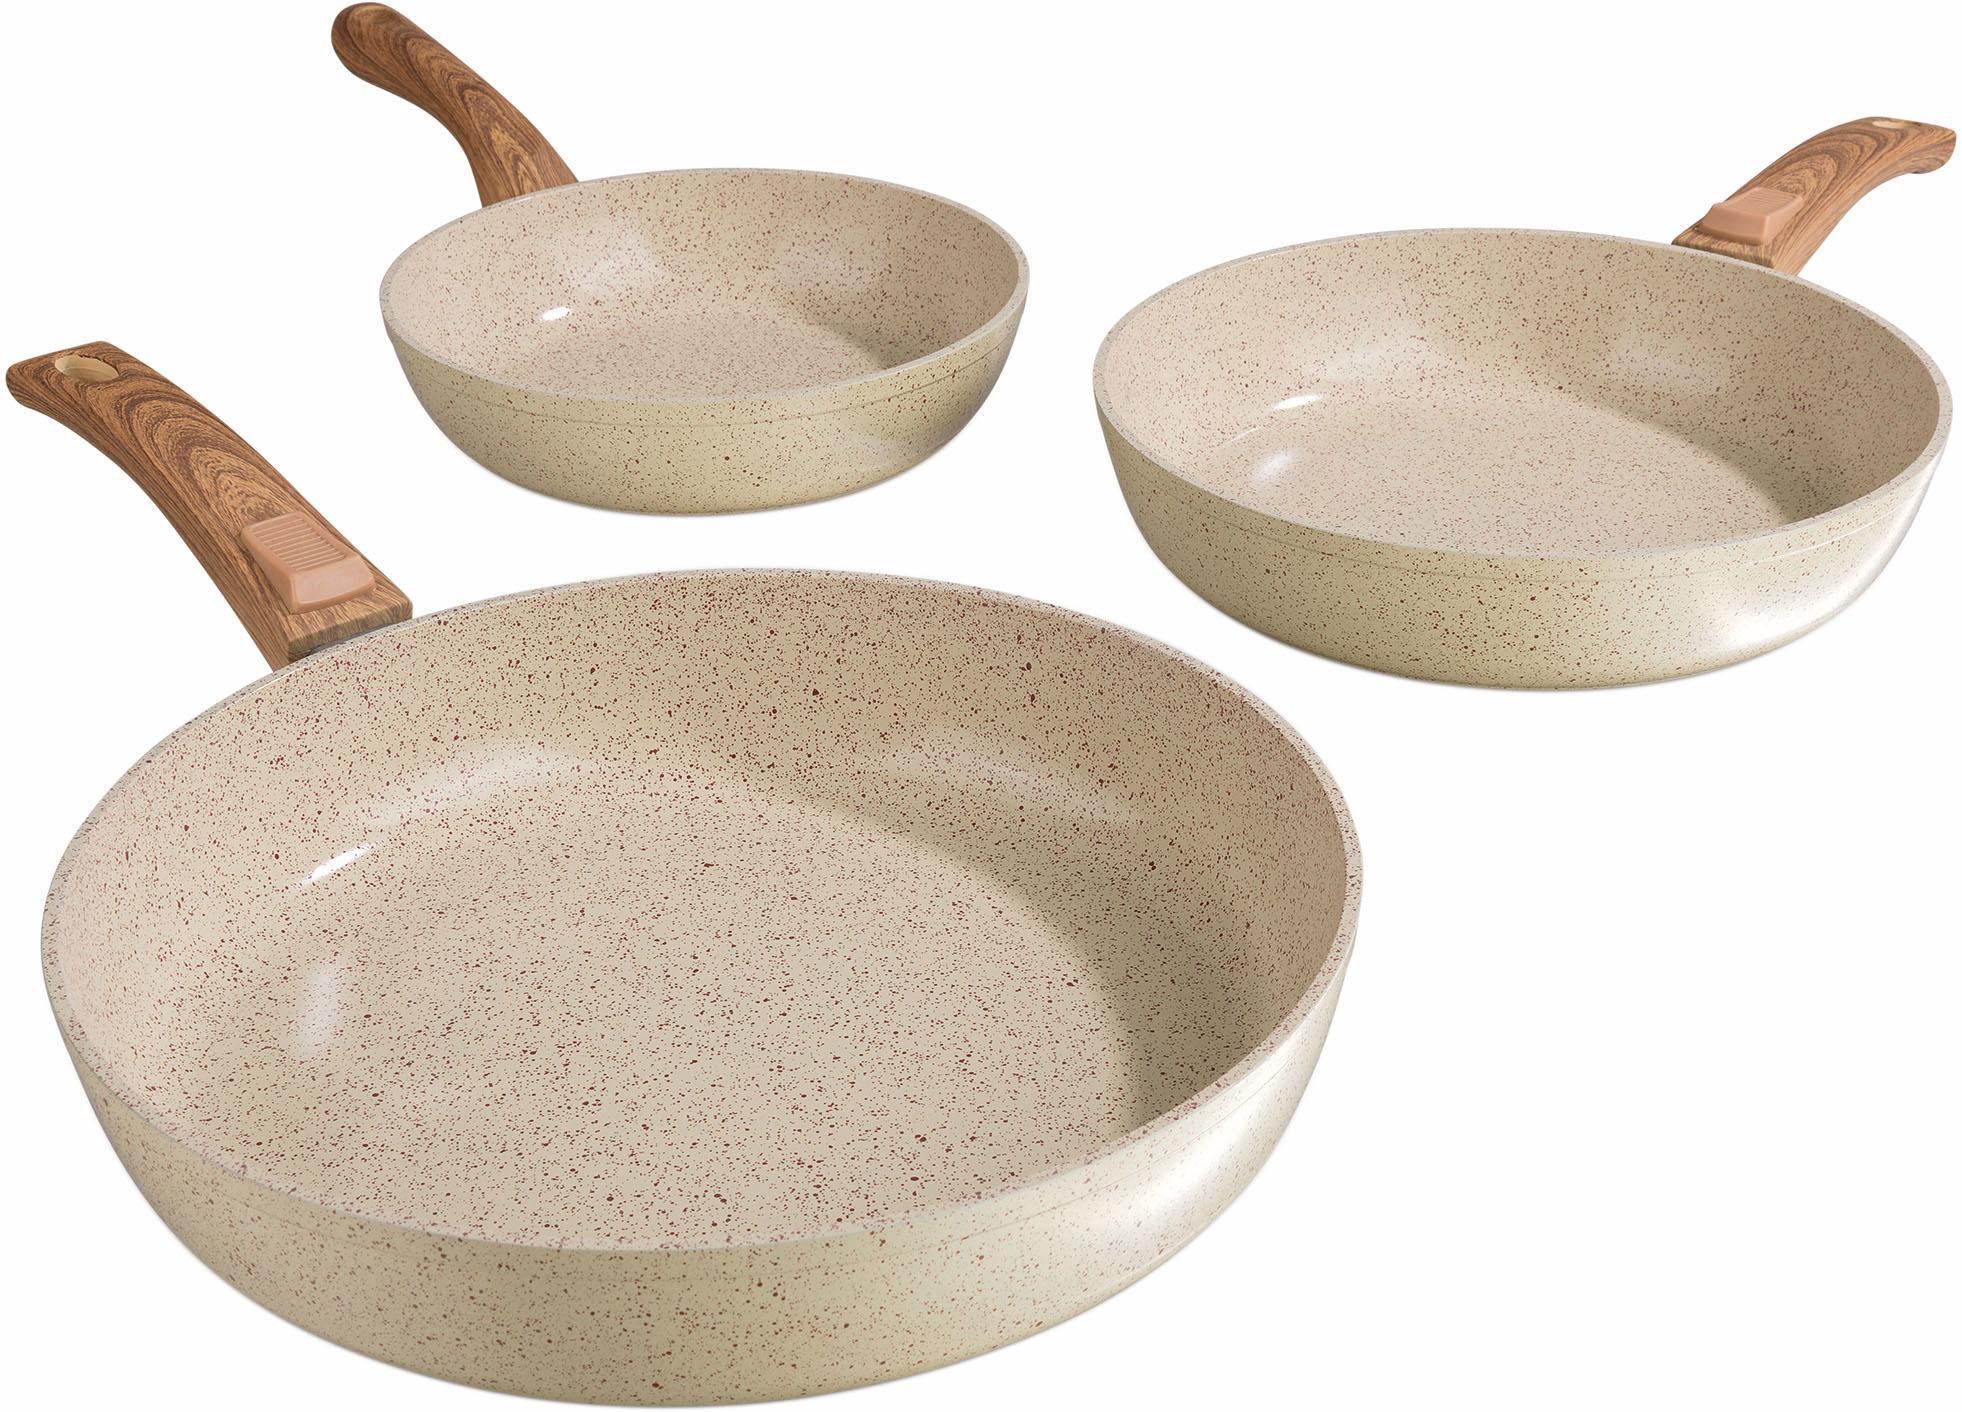 BRATMAXX BRATmaxx Geschmiedete Keramikpfannen, Aluminium, Induktion